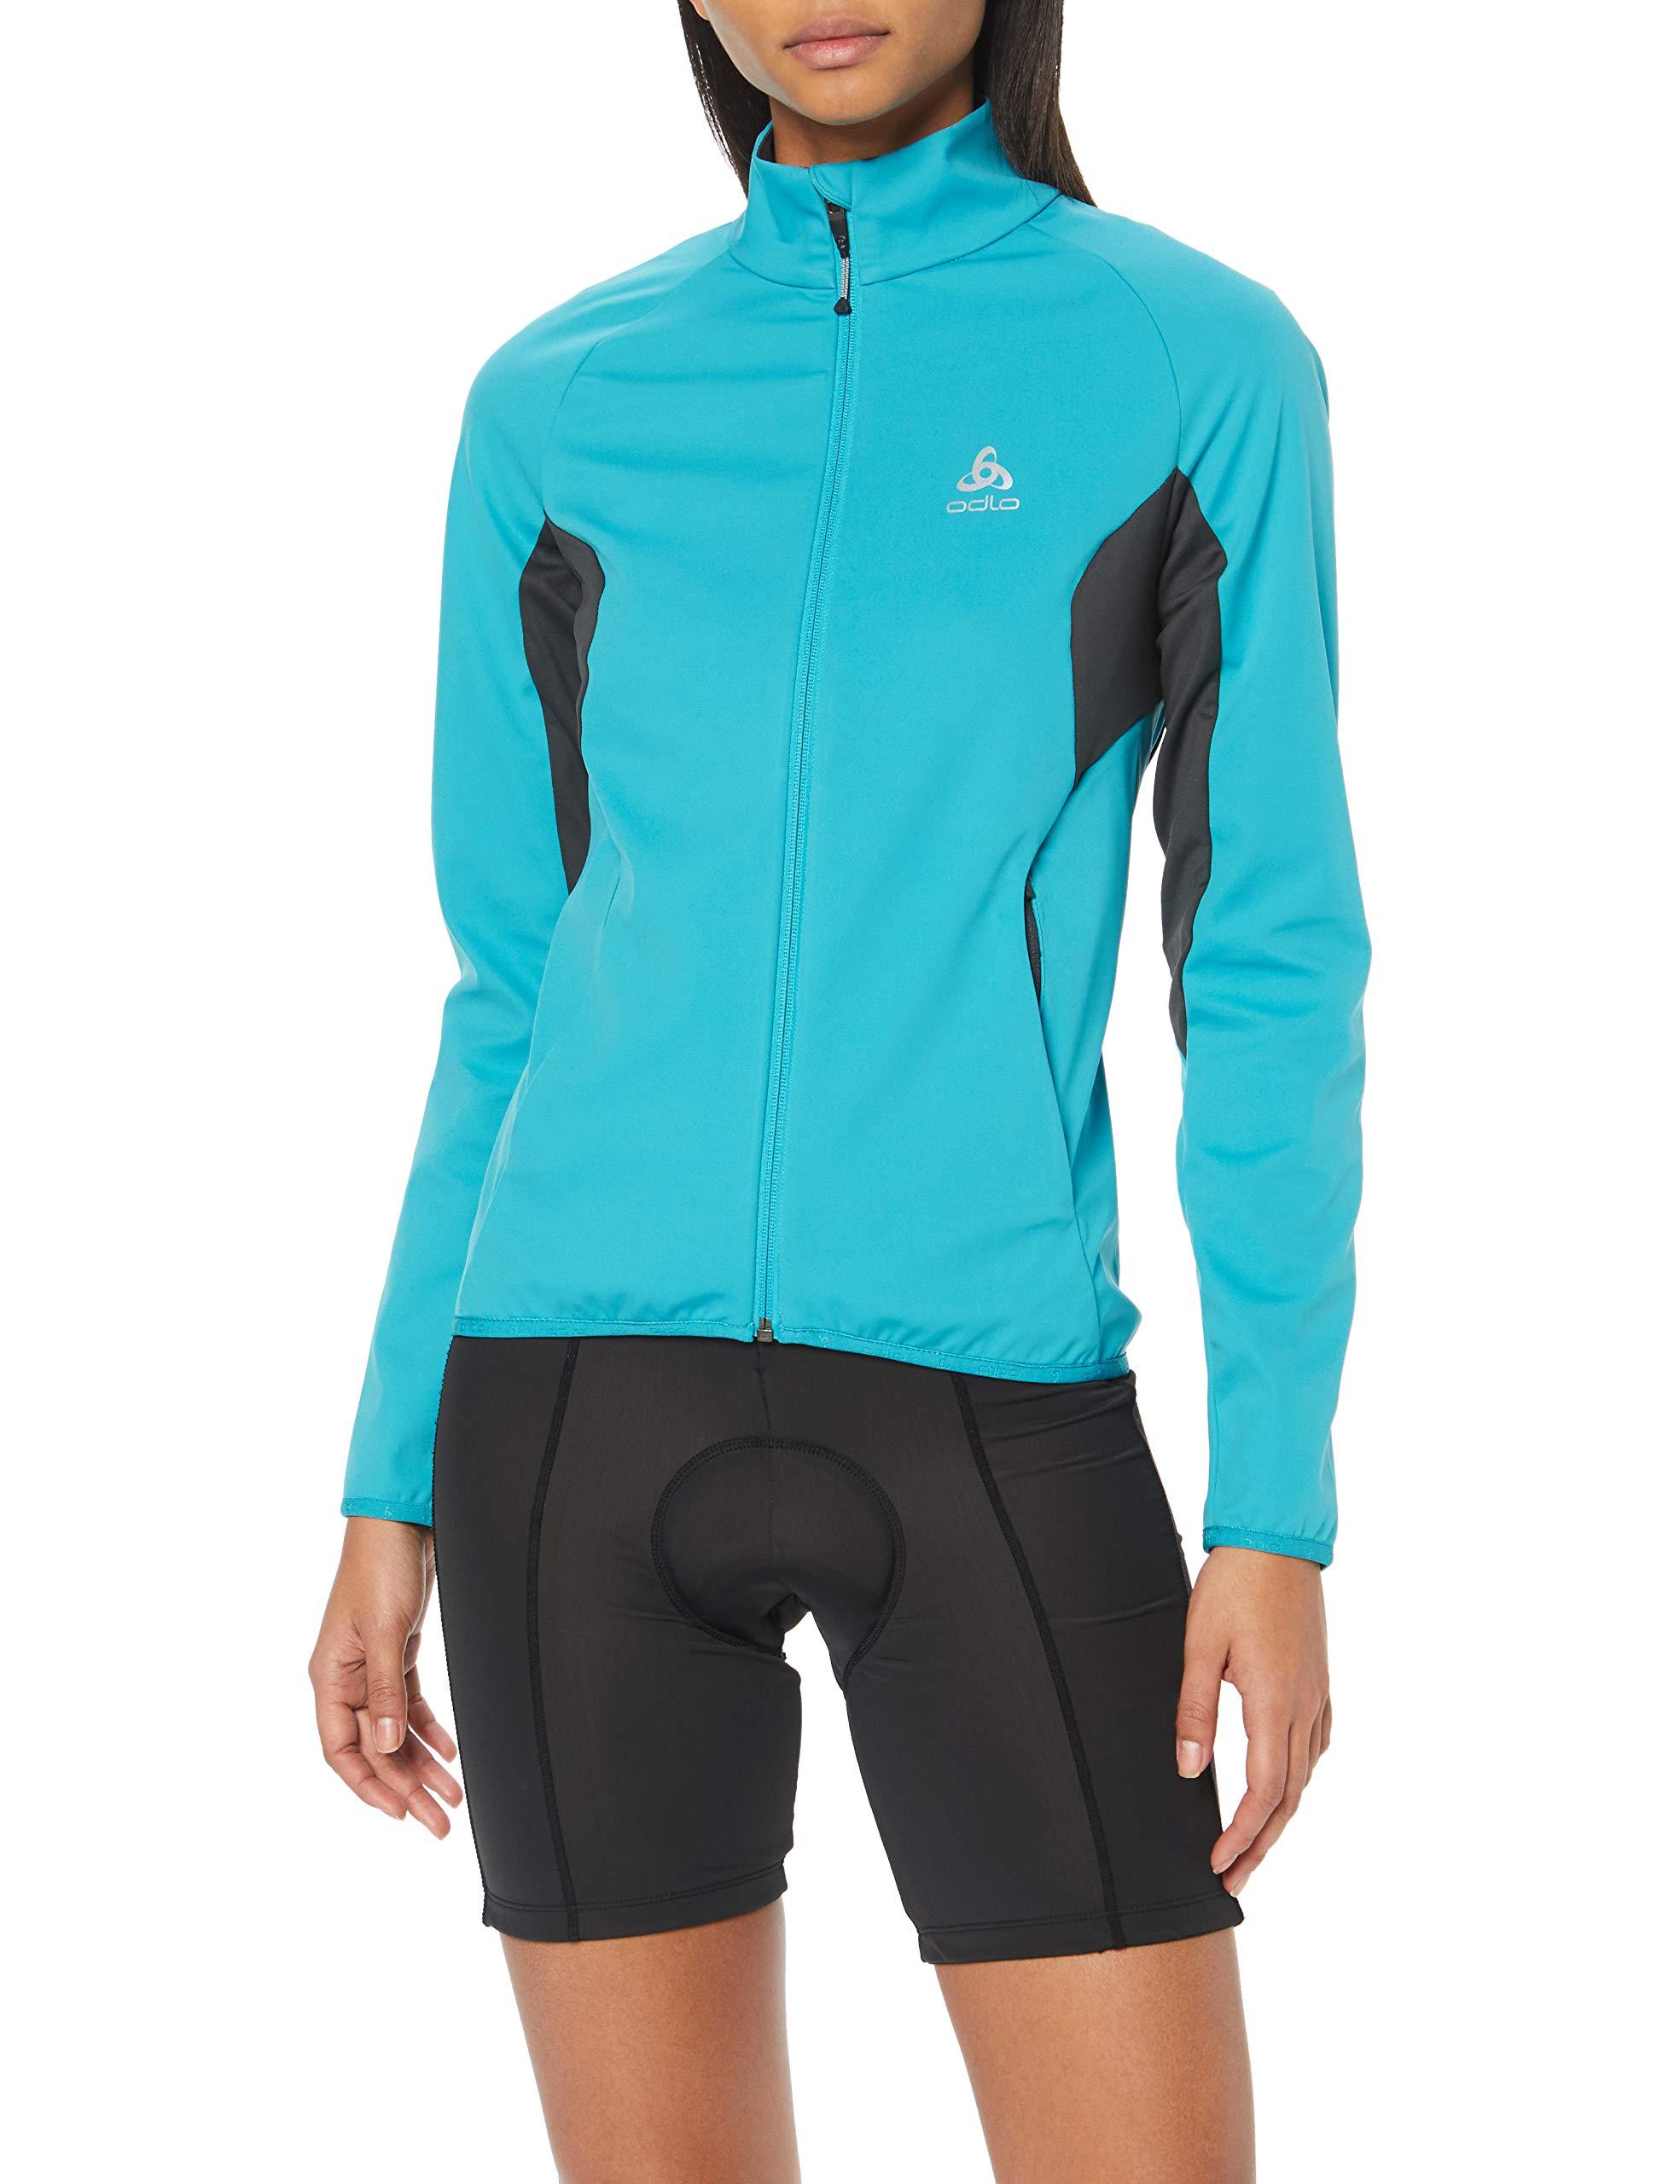 De graphite Veste SportMulticolorealgiers Grey Odlo Stryn Softshell Jacket Blue 20267X small Femme srdxBthQCo